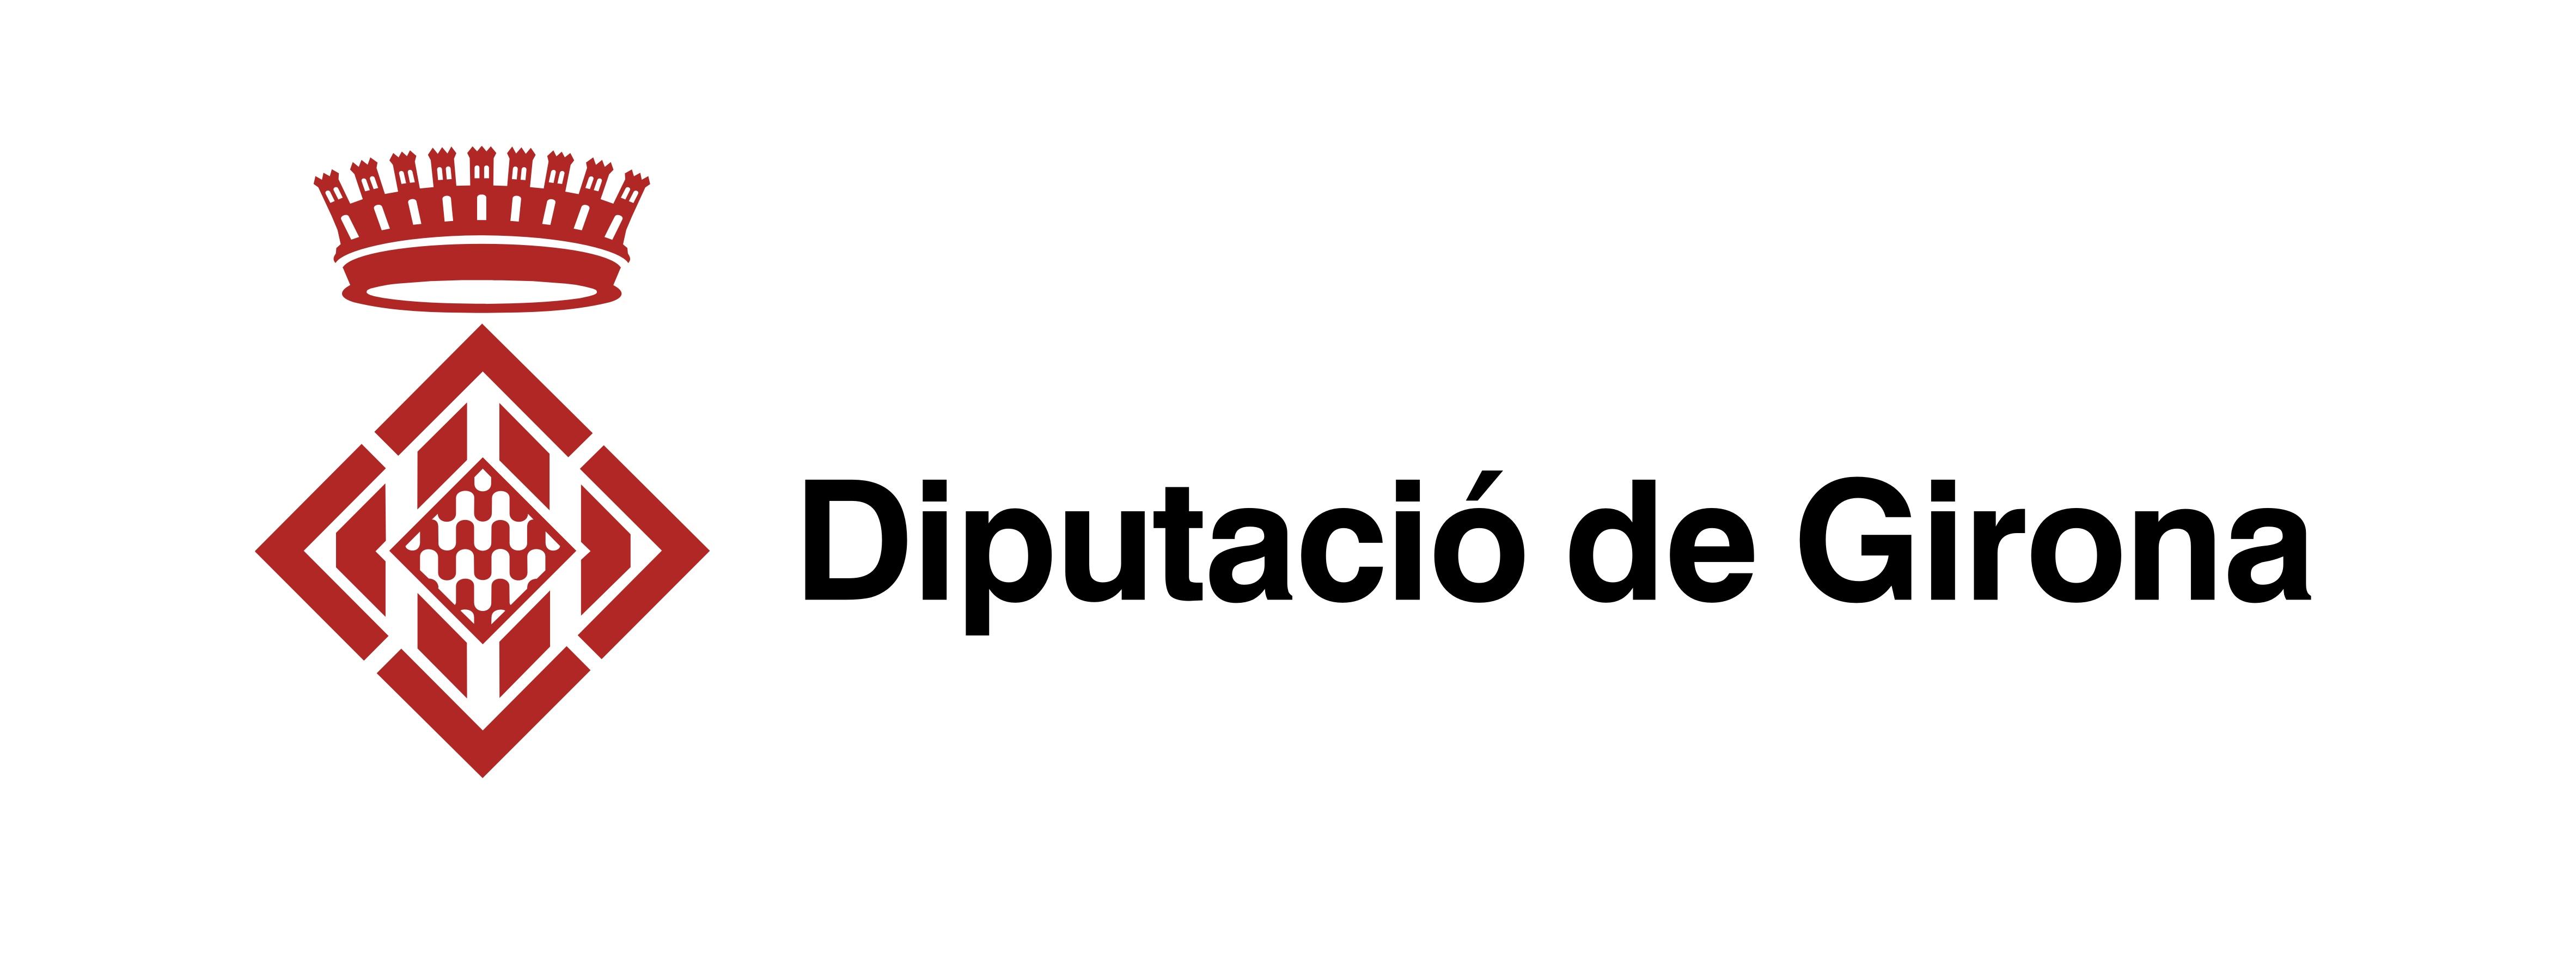 marca_diputacio_apaisada_2013